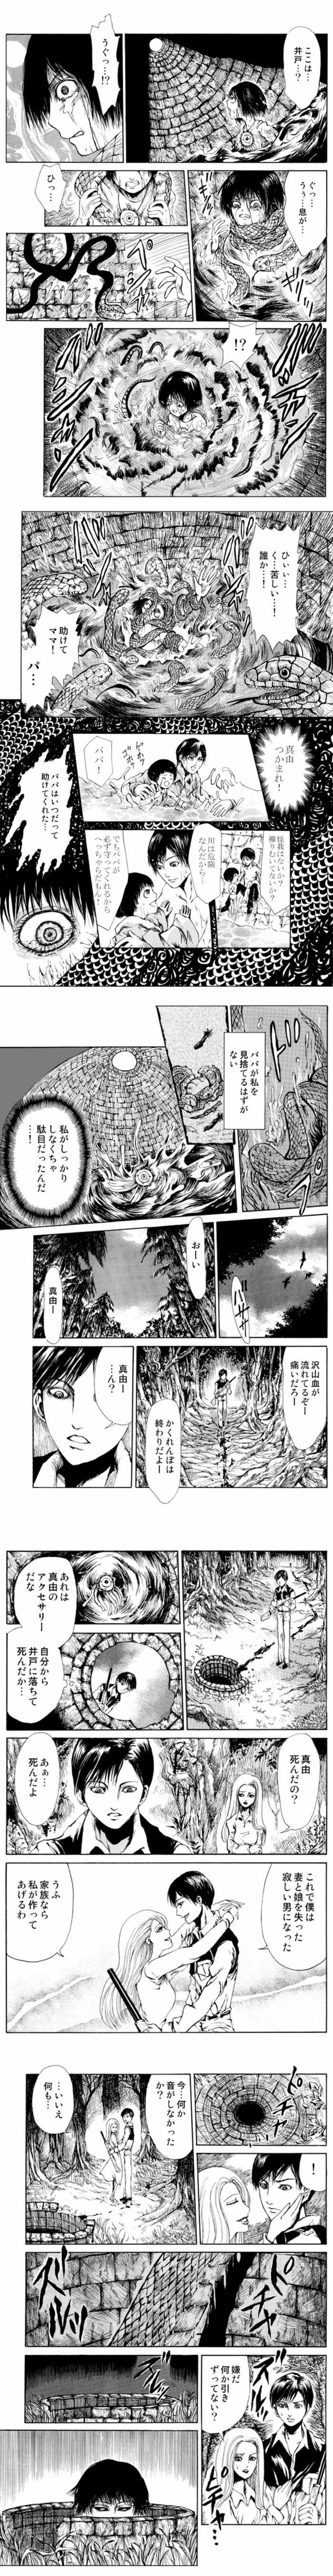 horror-gekijou01-03